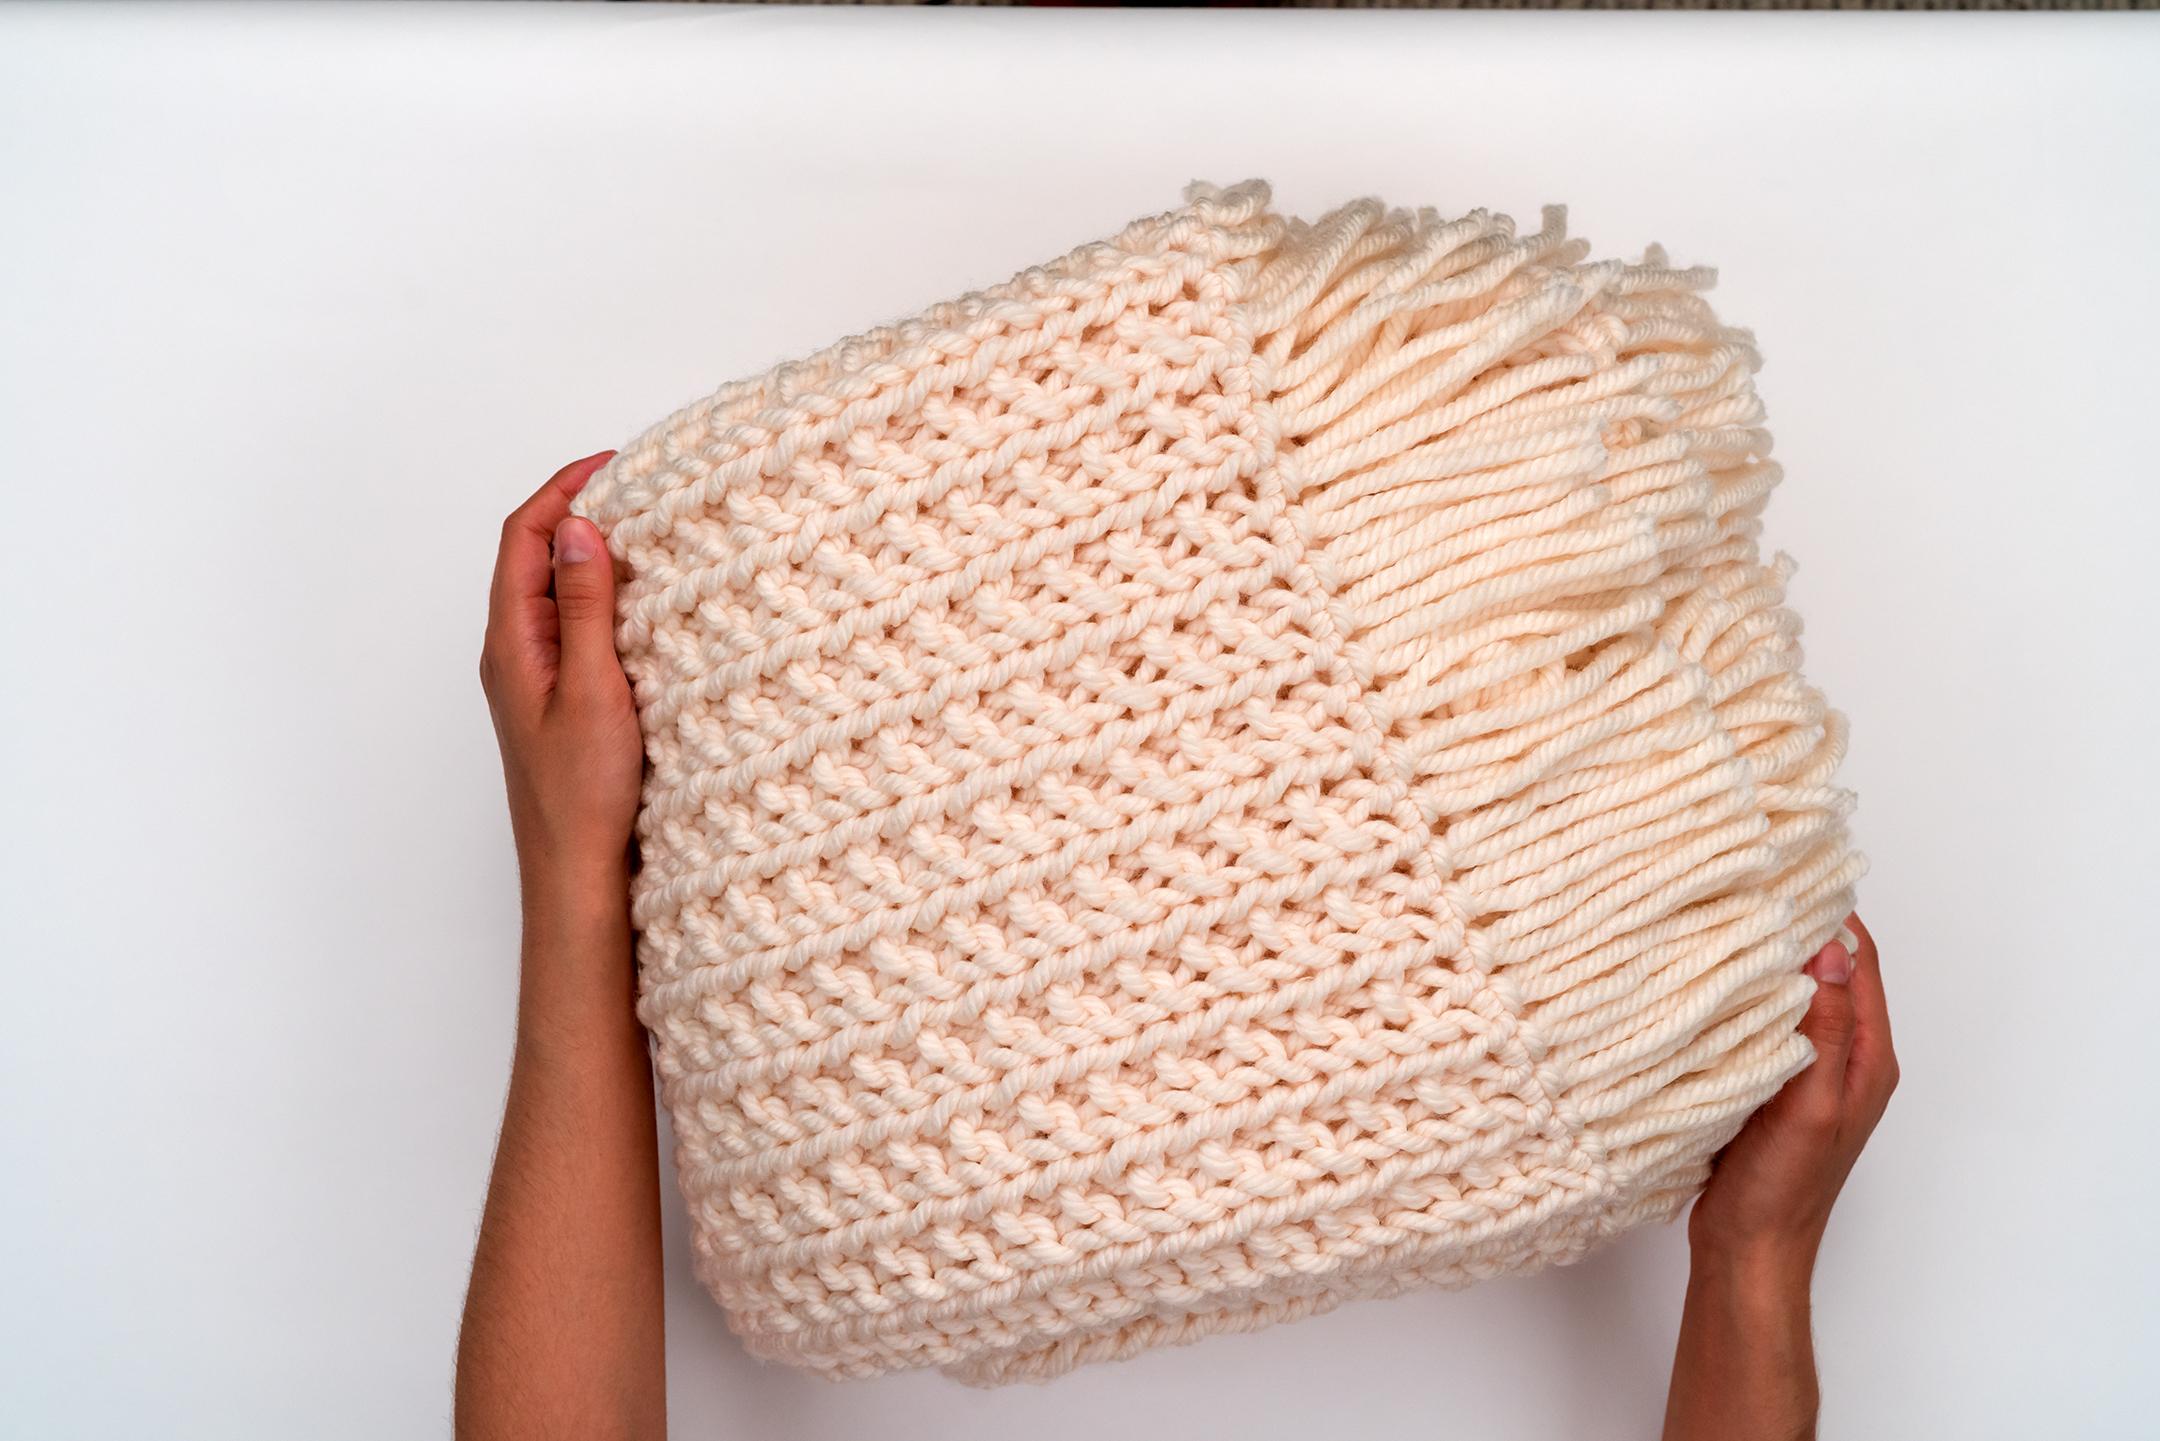 Knit Blanket Pattern The Chunky Knit Blanket Pattern Brennaannhandmade Hobium Blog